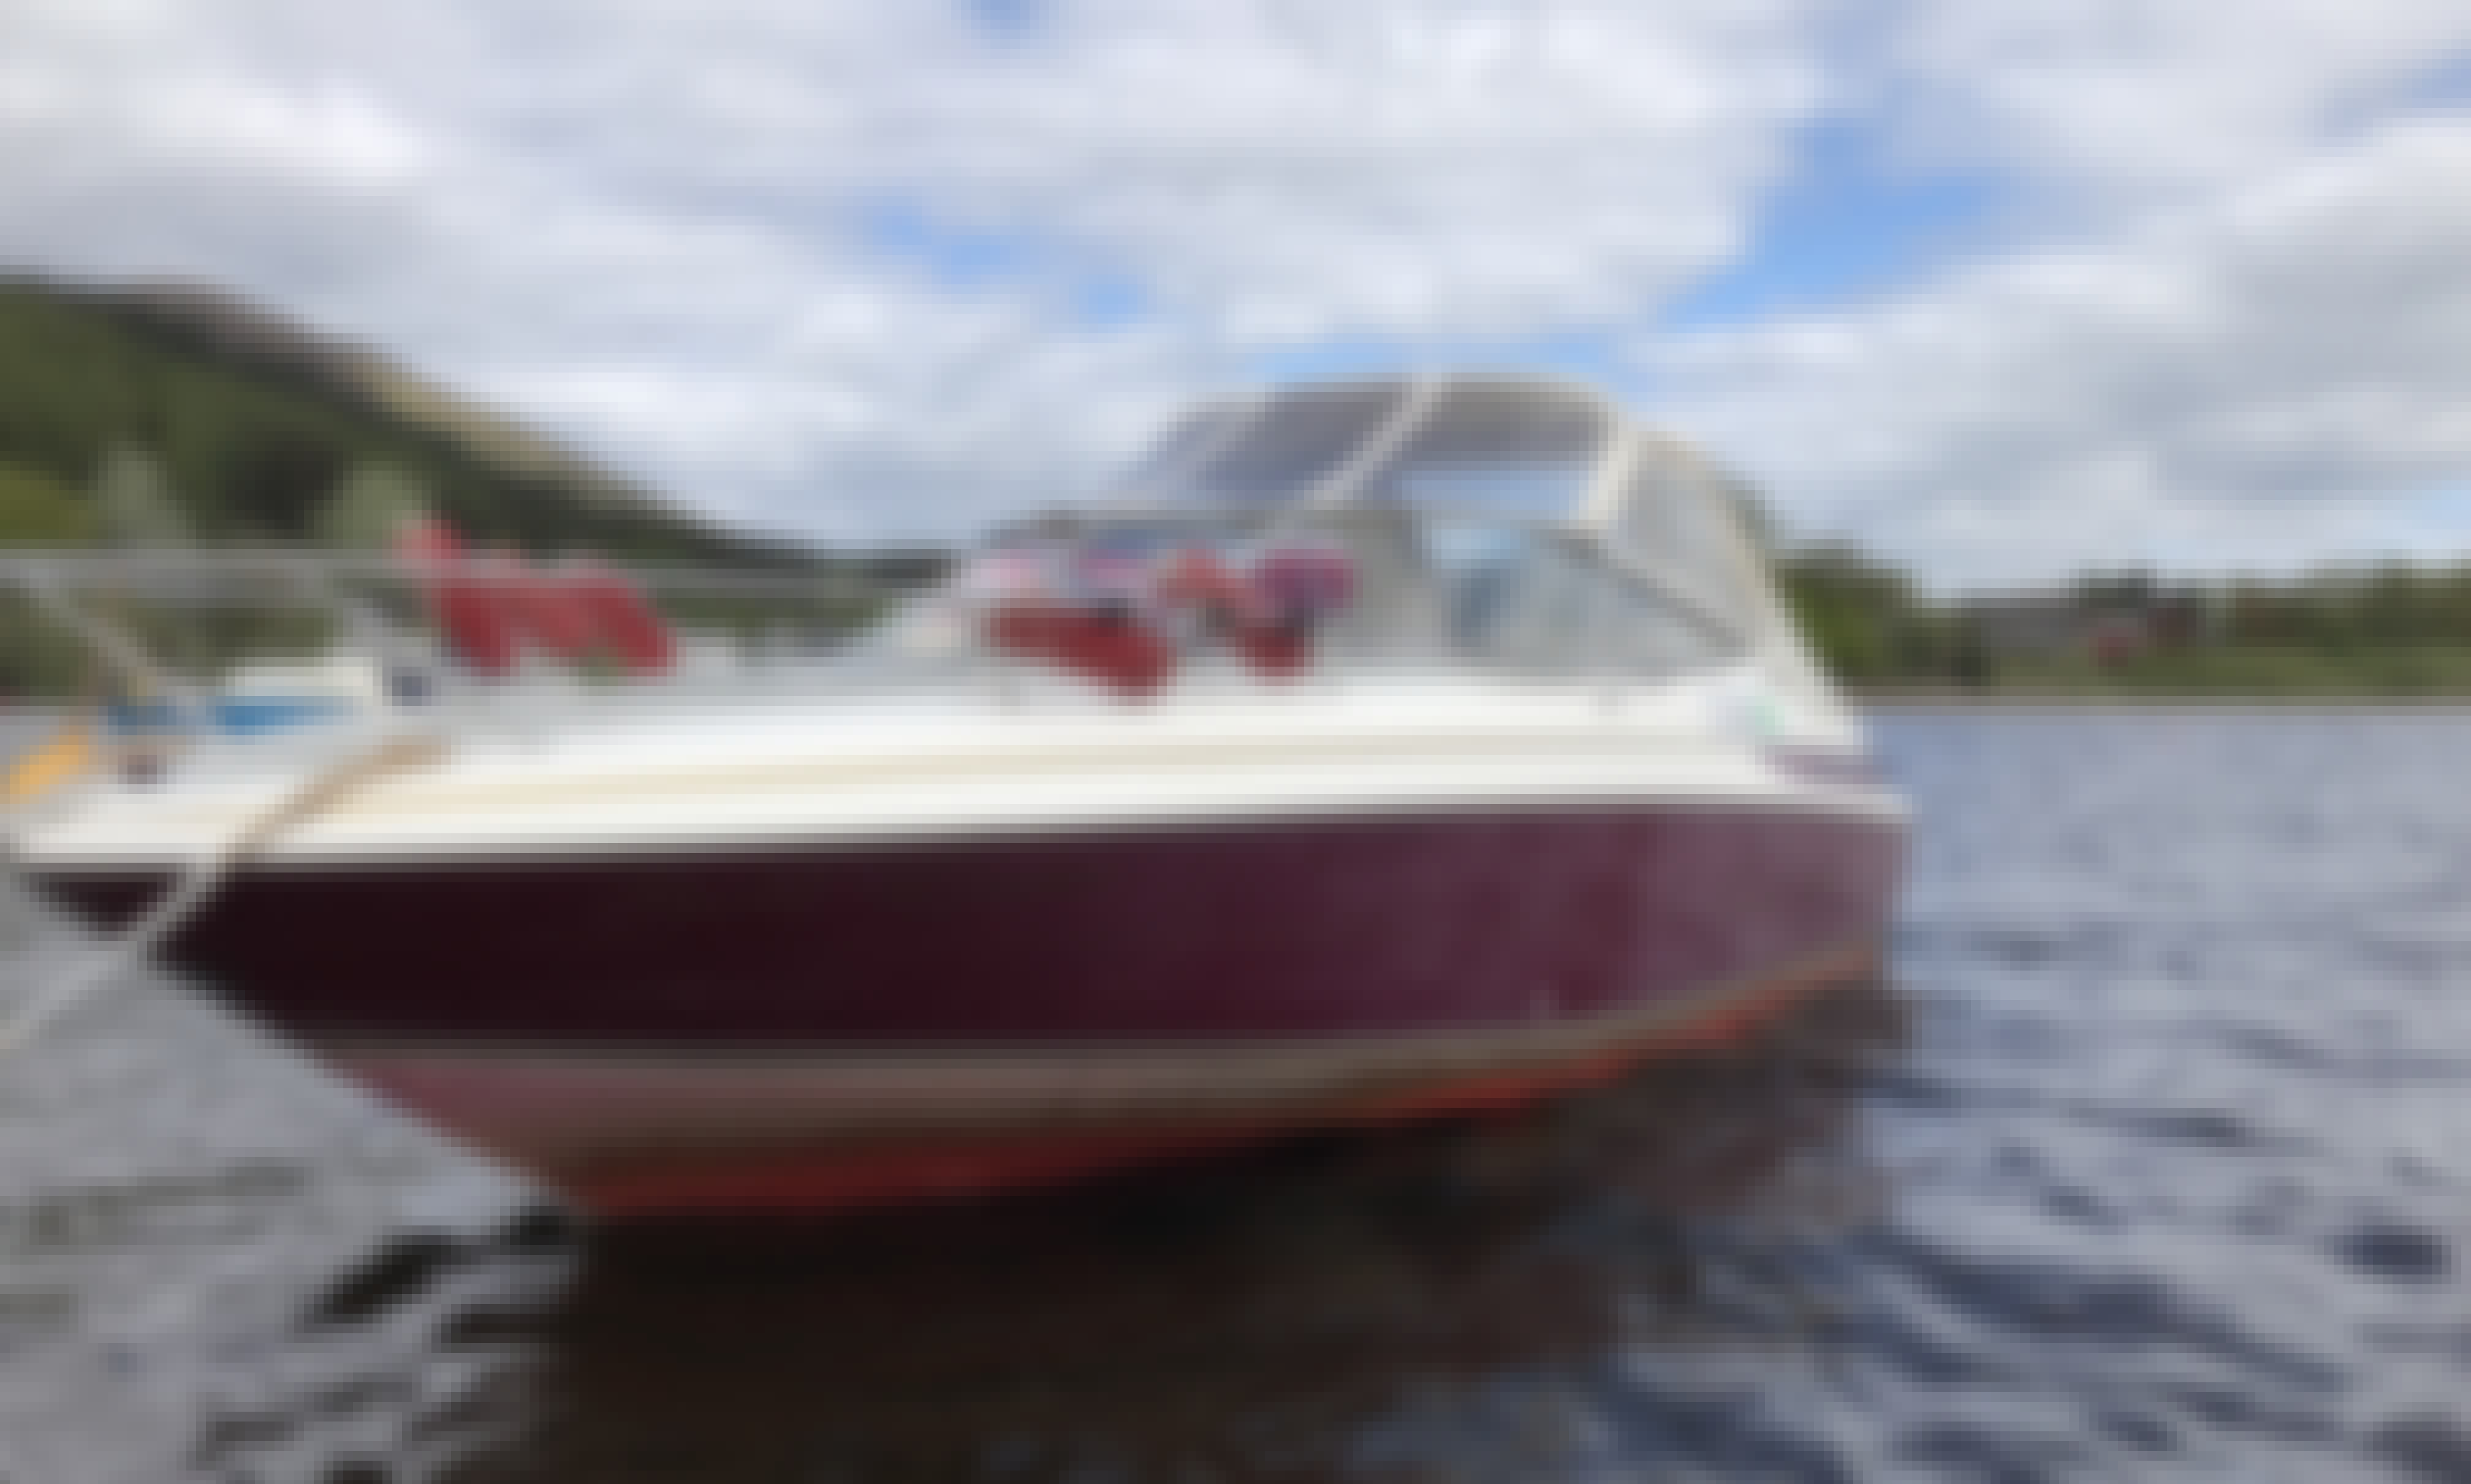 Rent a Maxum 2300SC Power Boat on Loch Lomond, Scotland